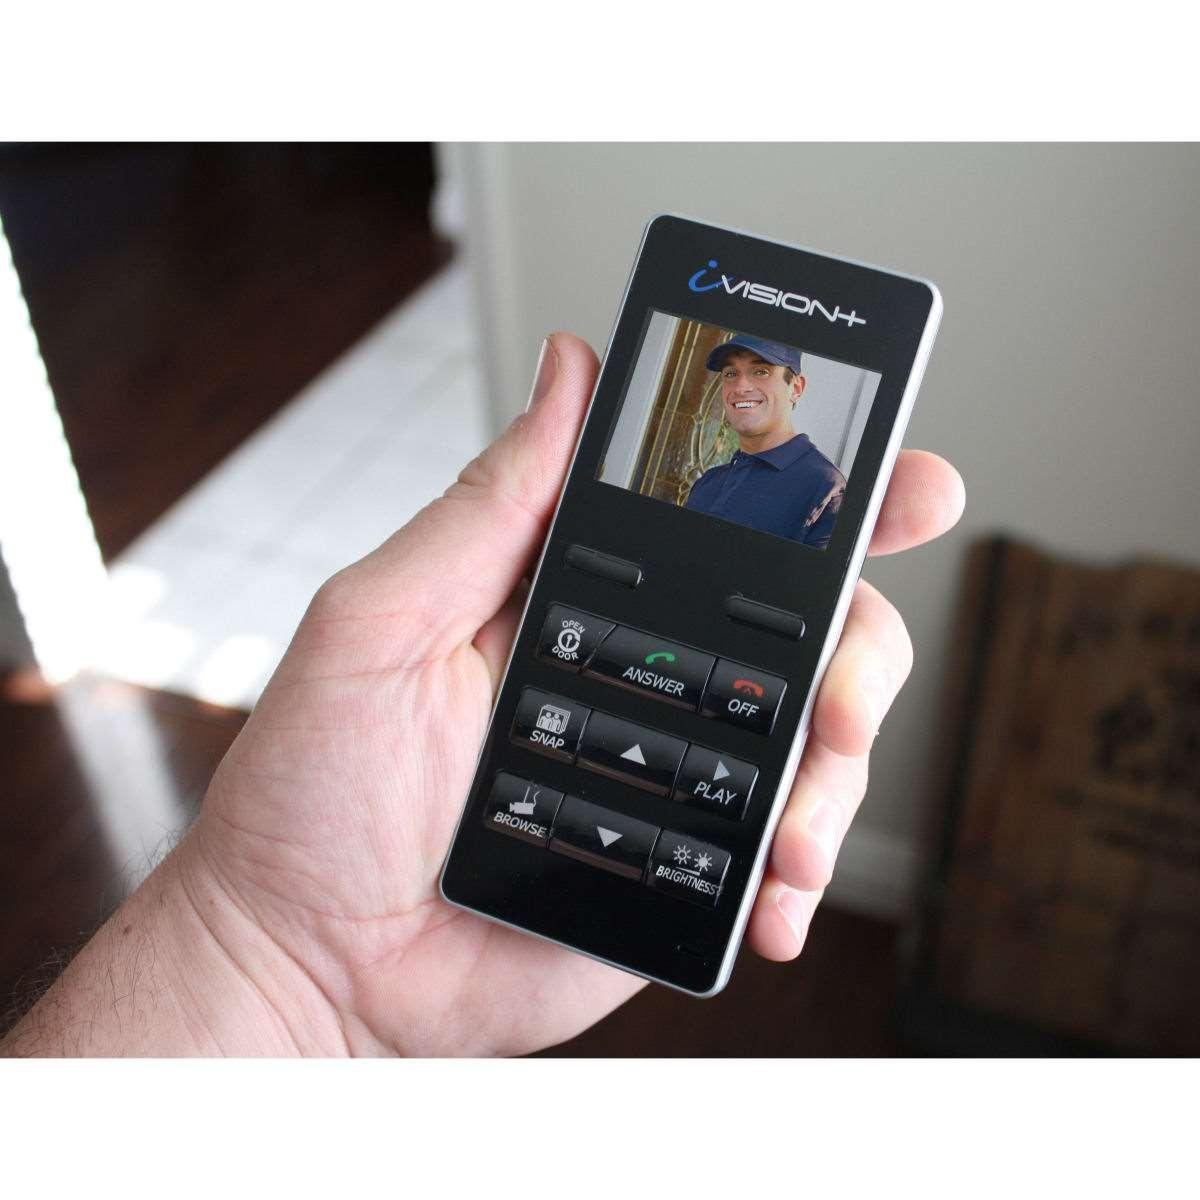 Ivision Handheld Unit Gokeyless